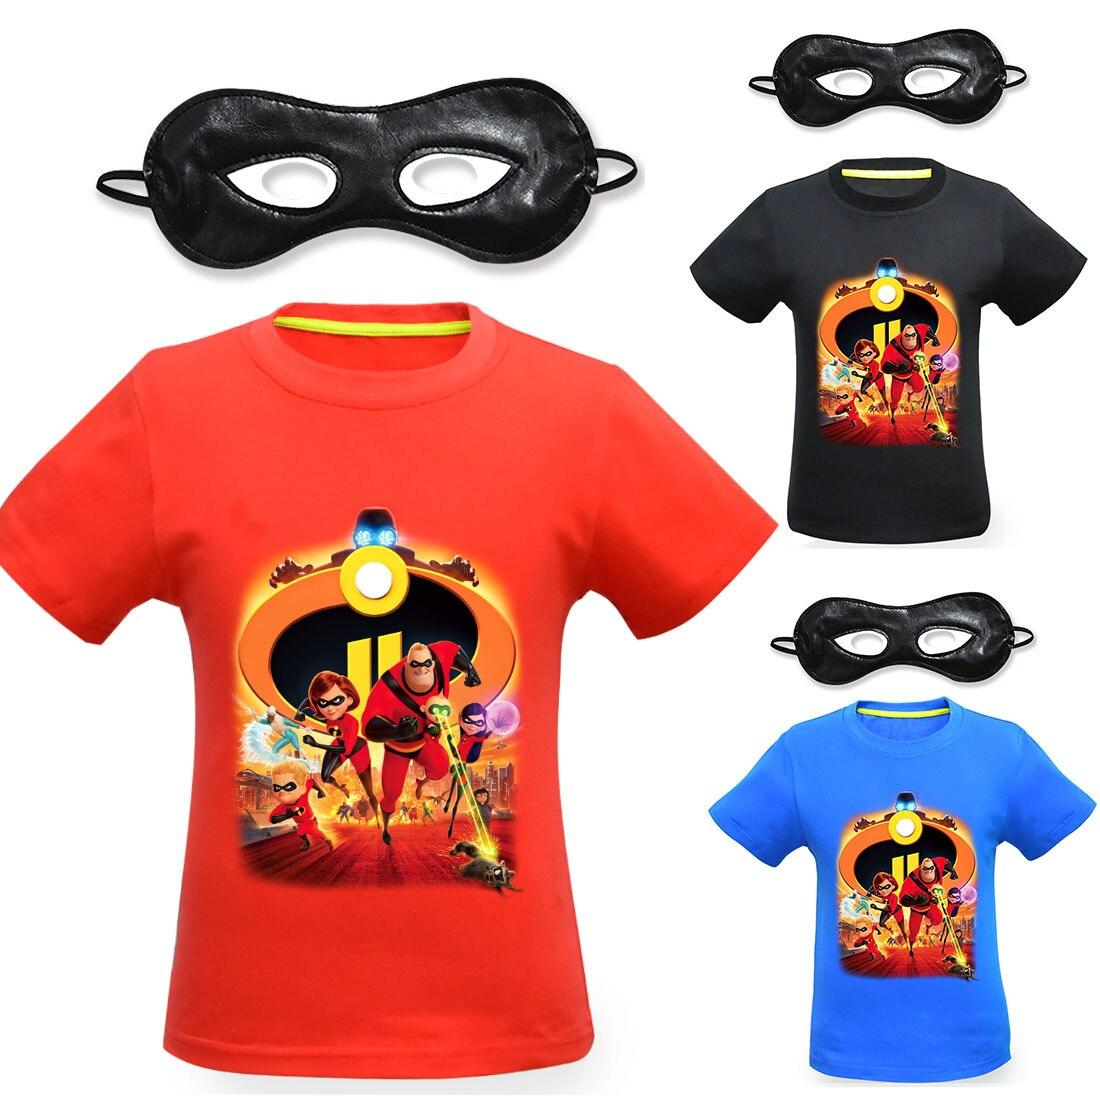 Kids The Incredibles 2 Summer T shirt Boy's Girl's Cartoon 3D T-shirt Child Top Tee Children's Clothing Cosplay Costume